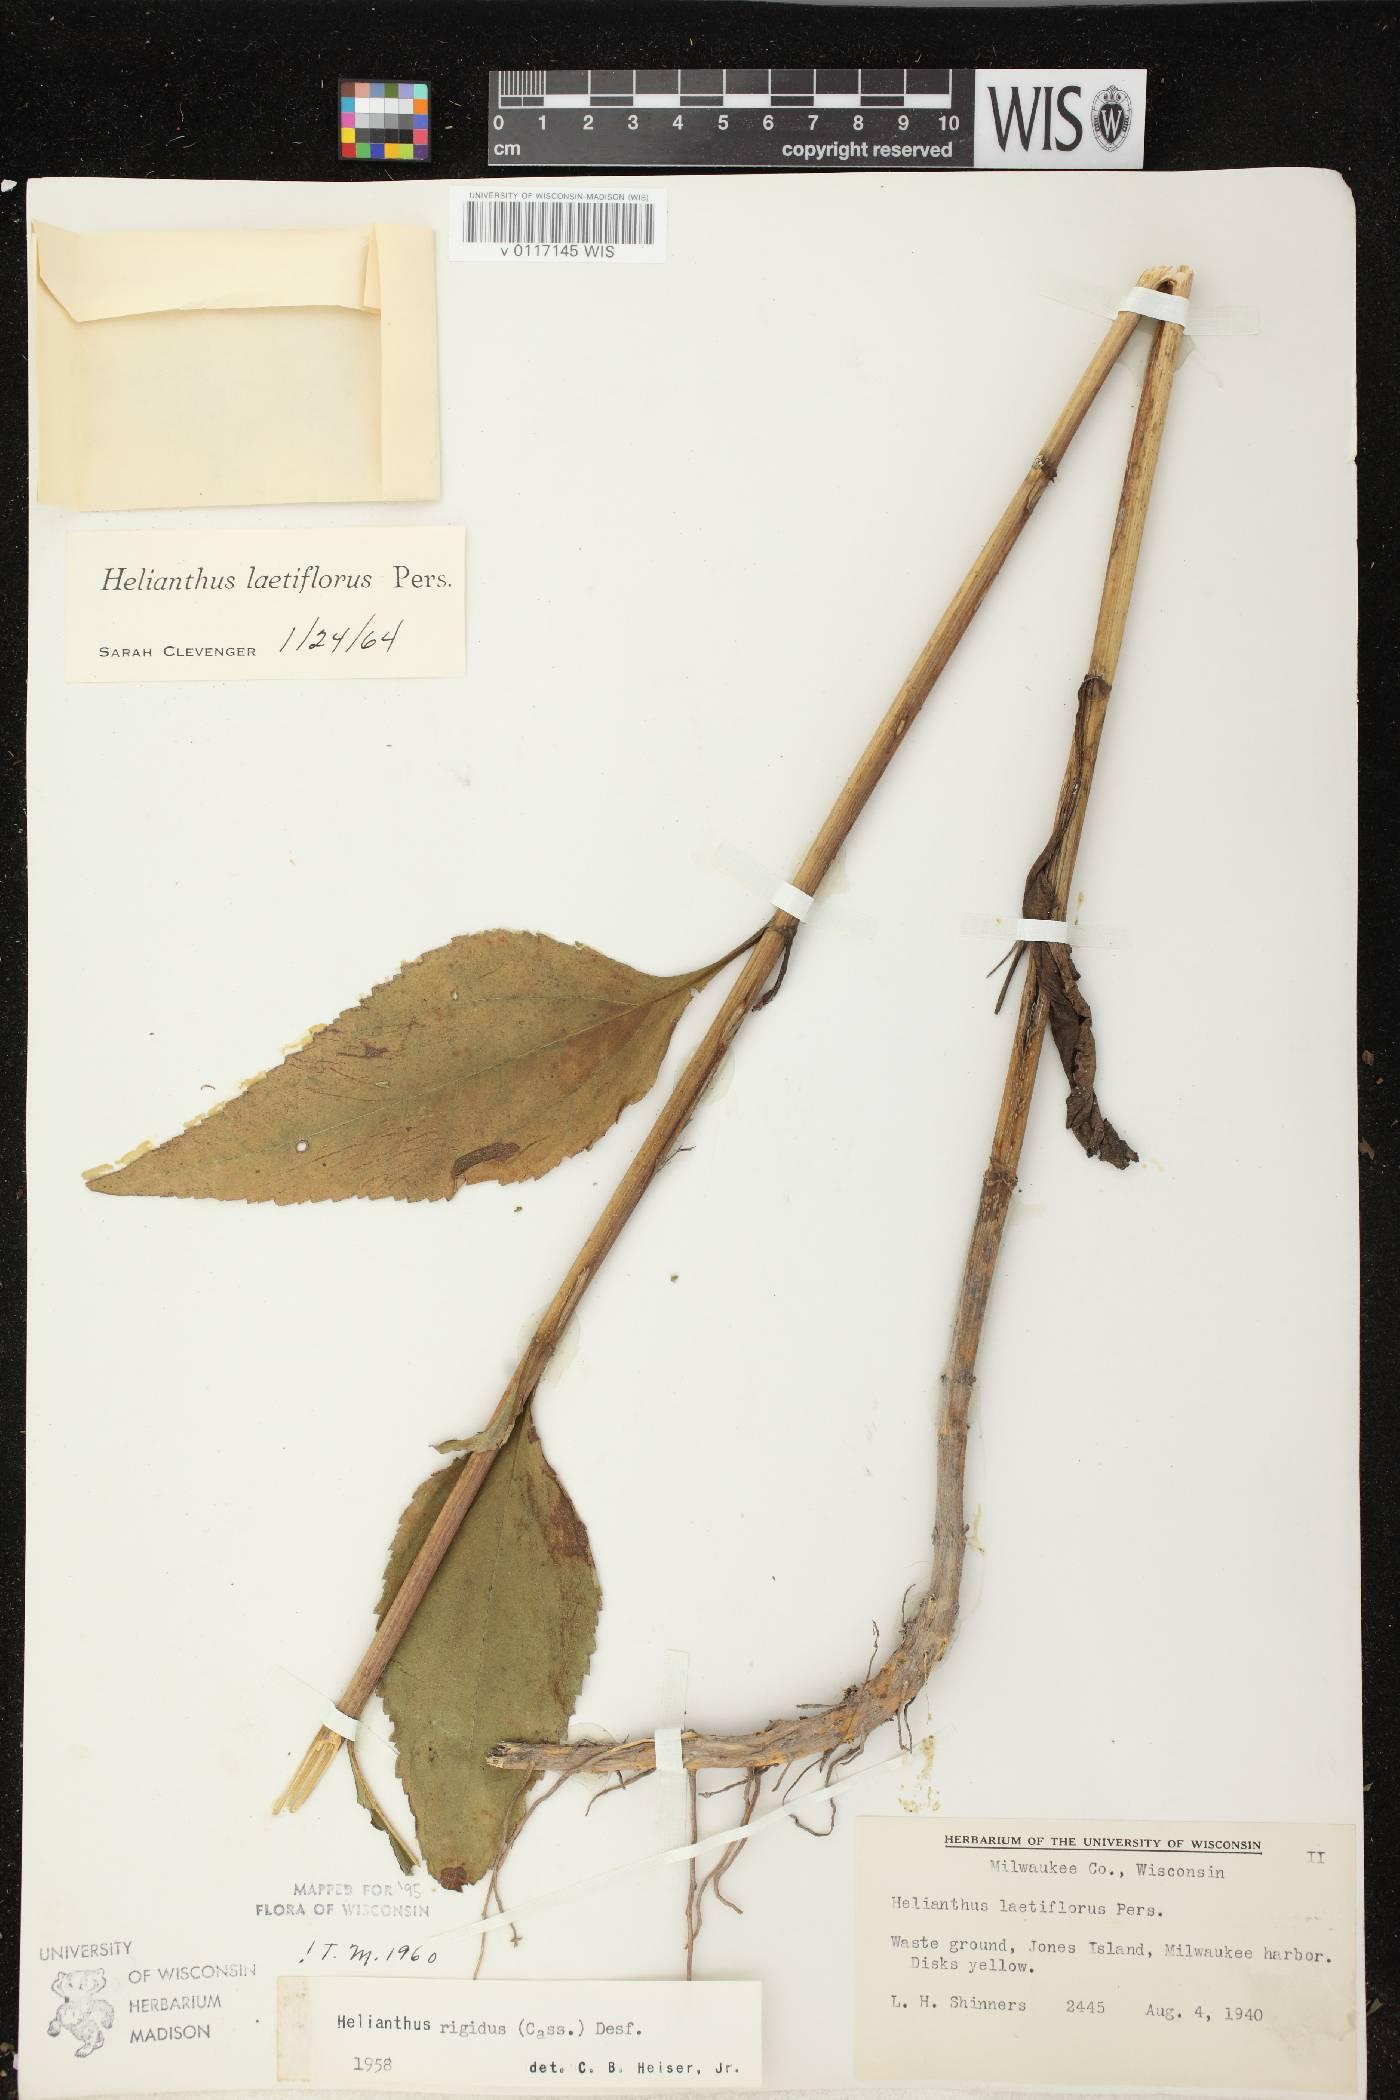 Helianthus X laetiflorus image